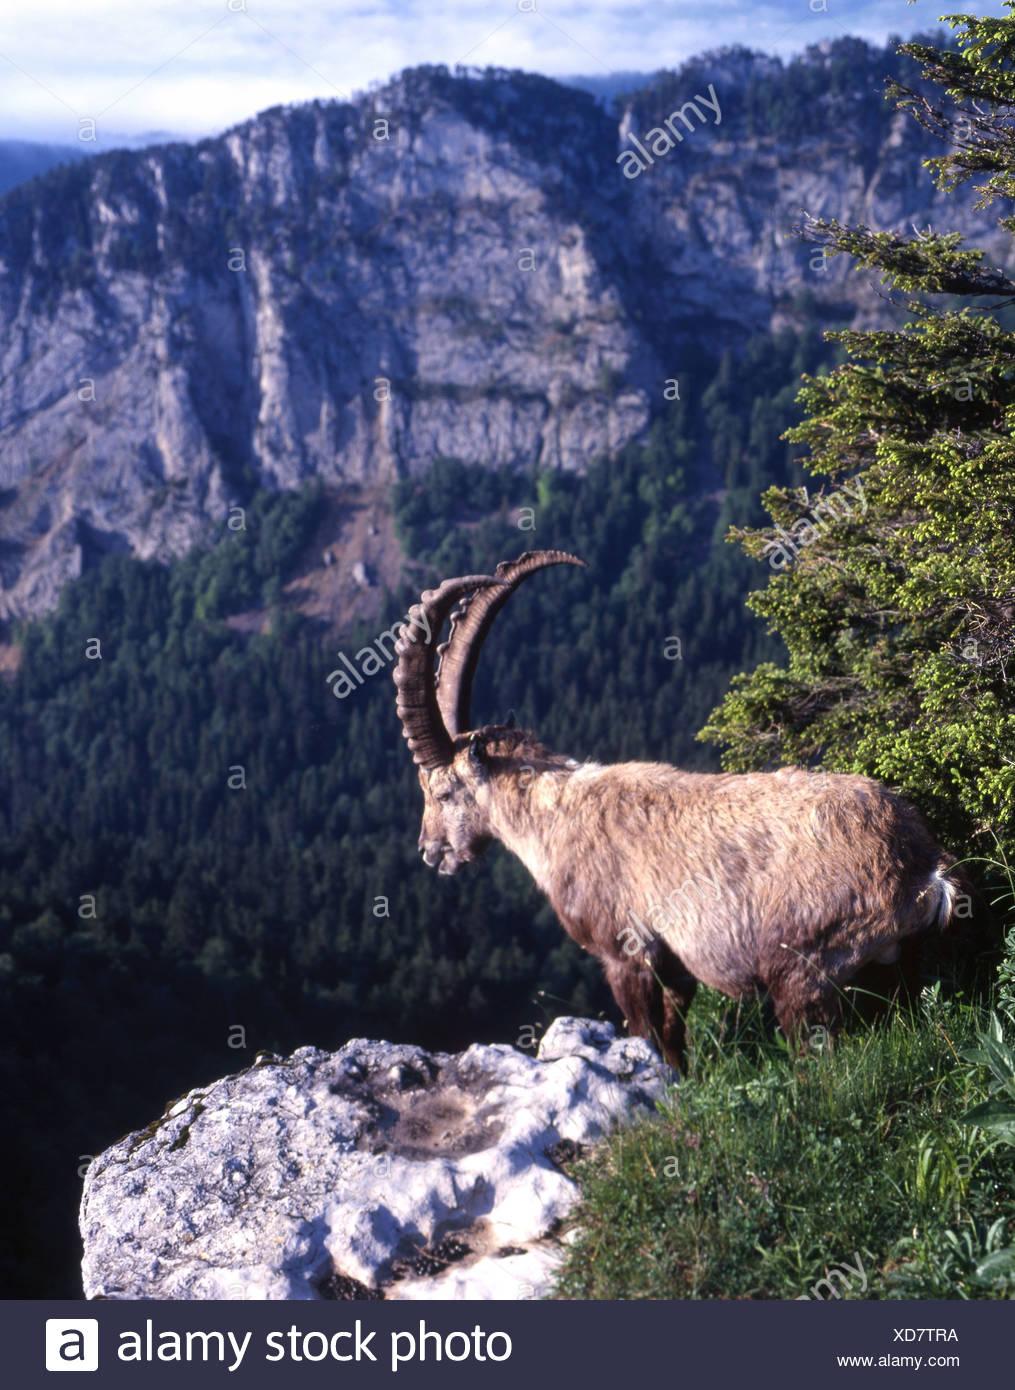 Capricorn ibex Creux du van canton Neuenburg Switzerland Europe - Stock Image